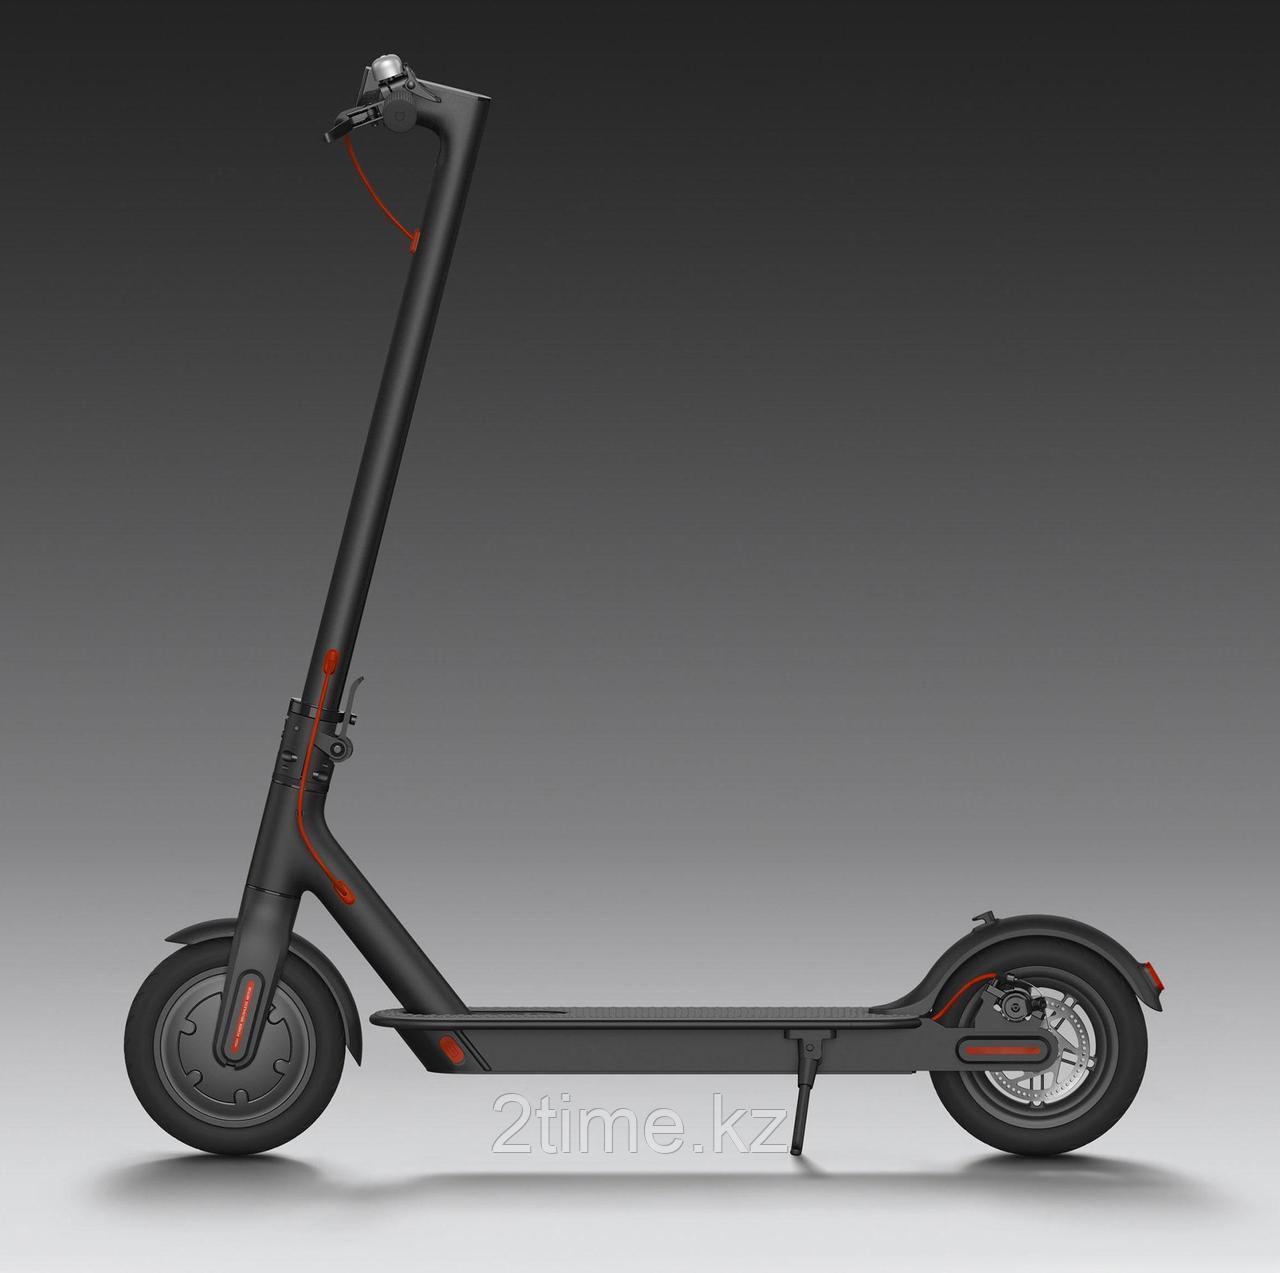 Электросамокат Xiaomi MiJia Smart Electric Scooter FBC4003GL M365 Черный